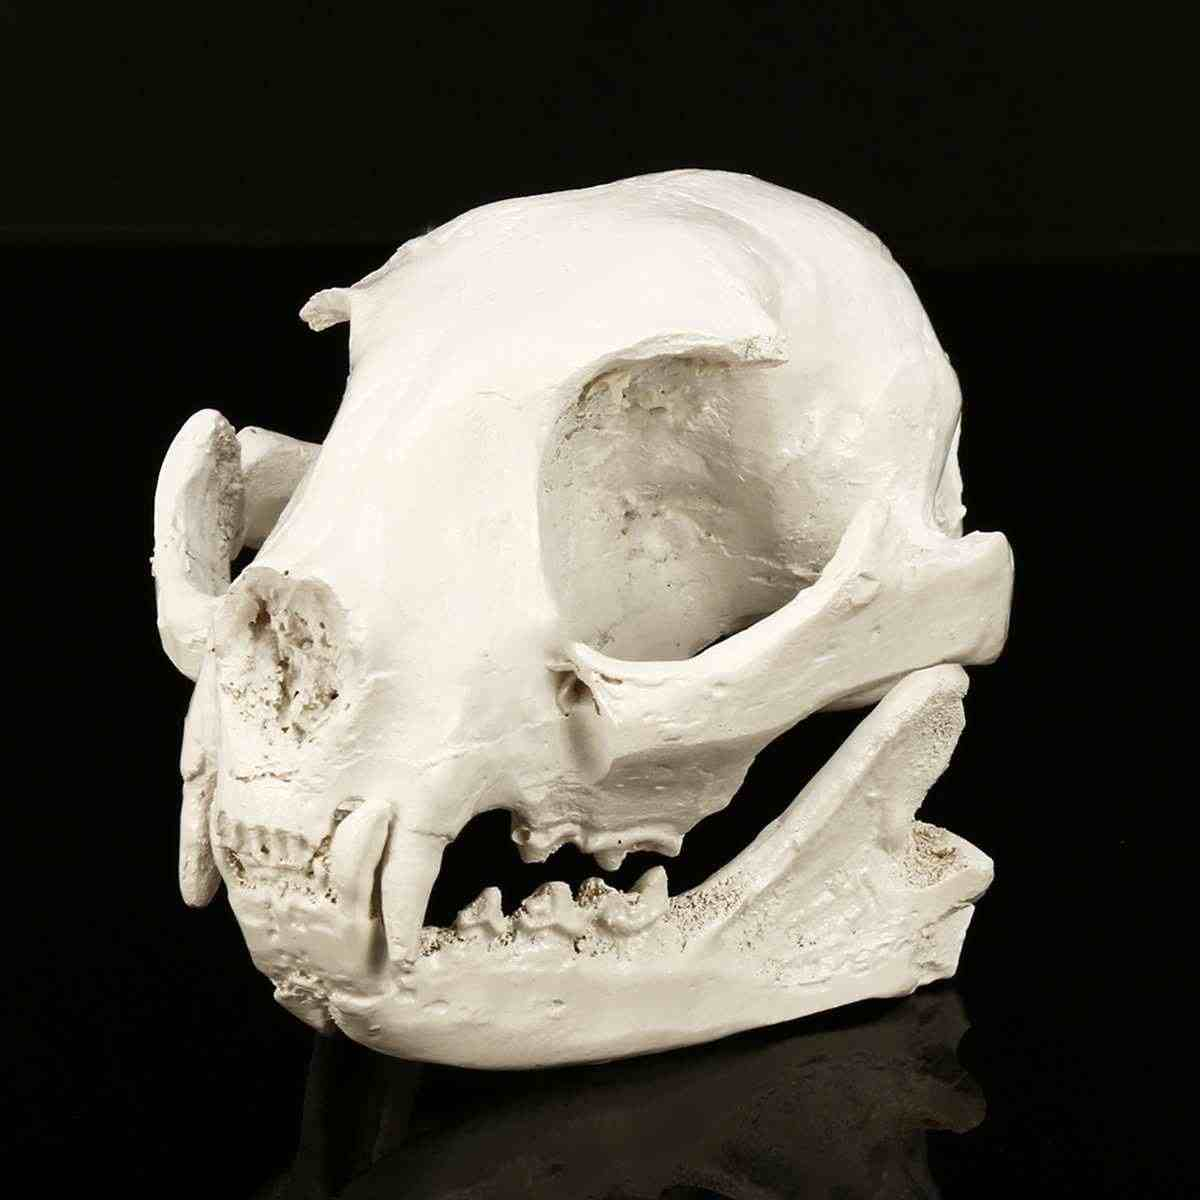 1Pc Fortune Cat Resin Skull Sculpture Statue Skeleton Model Home Aquarium Fish Tank Ornaments Water Grass Landscaping Home Decor